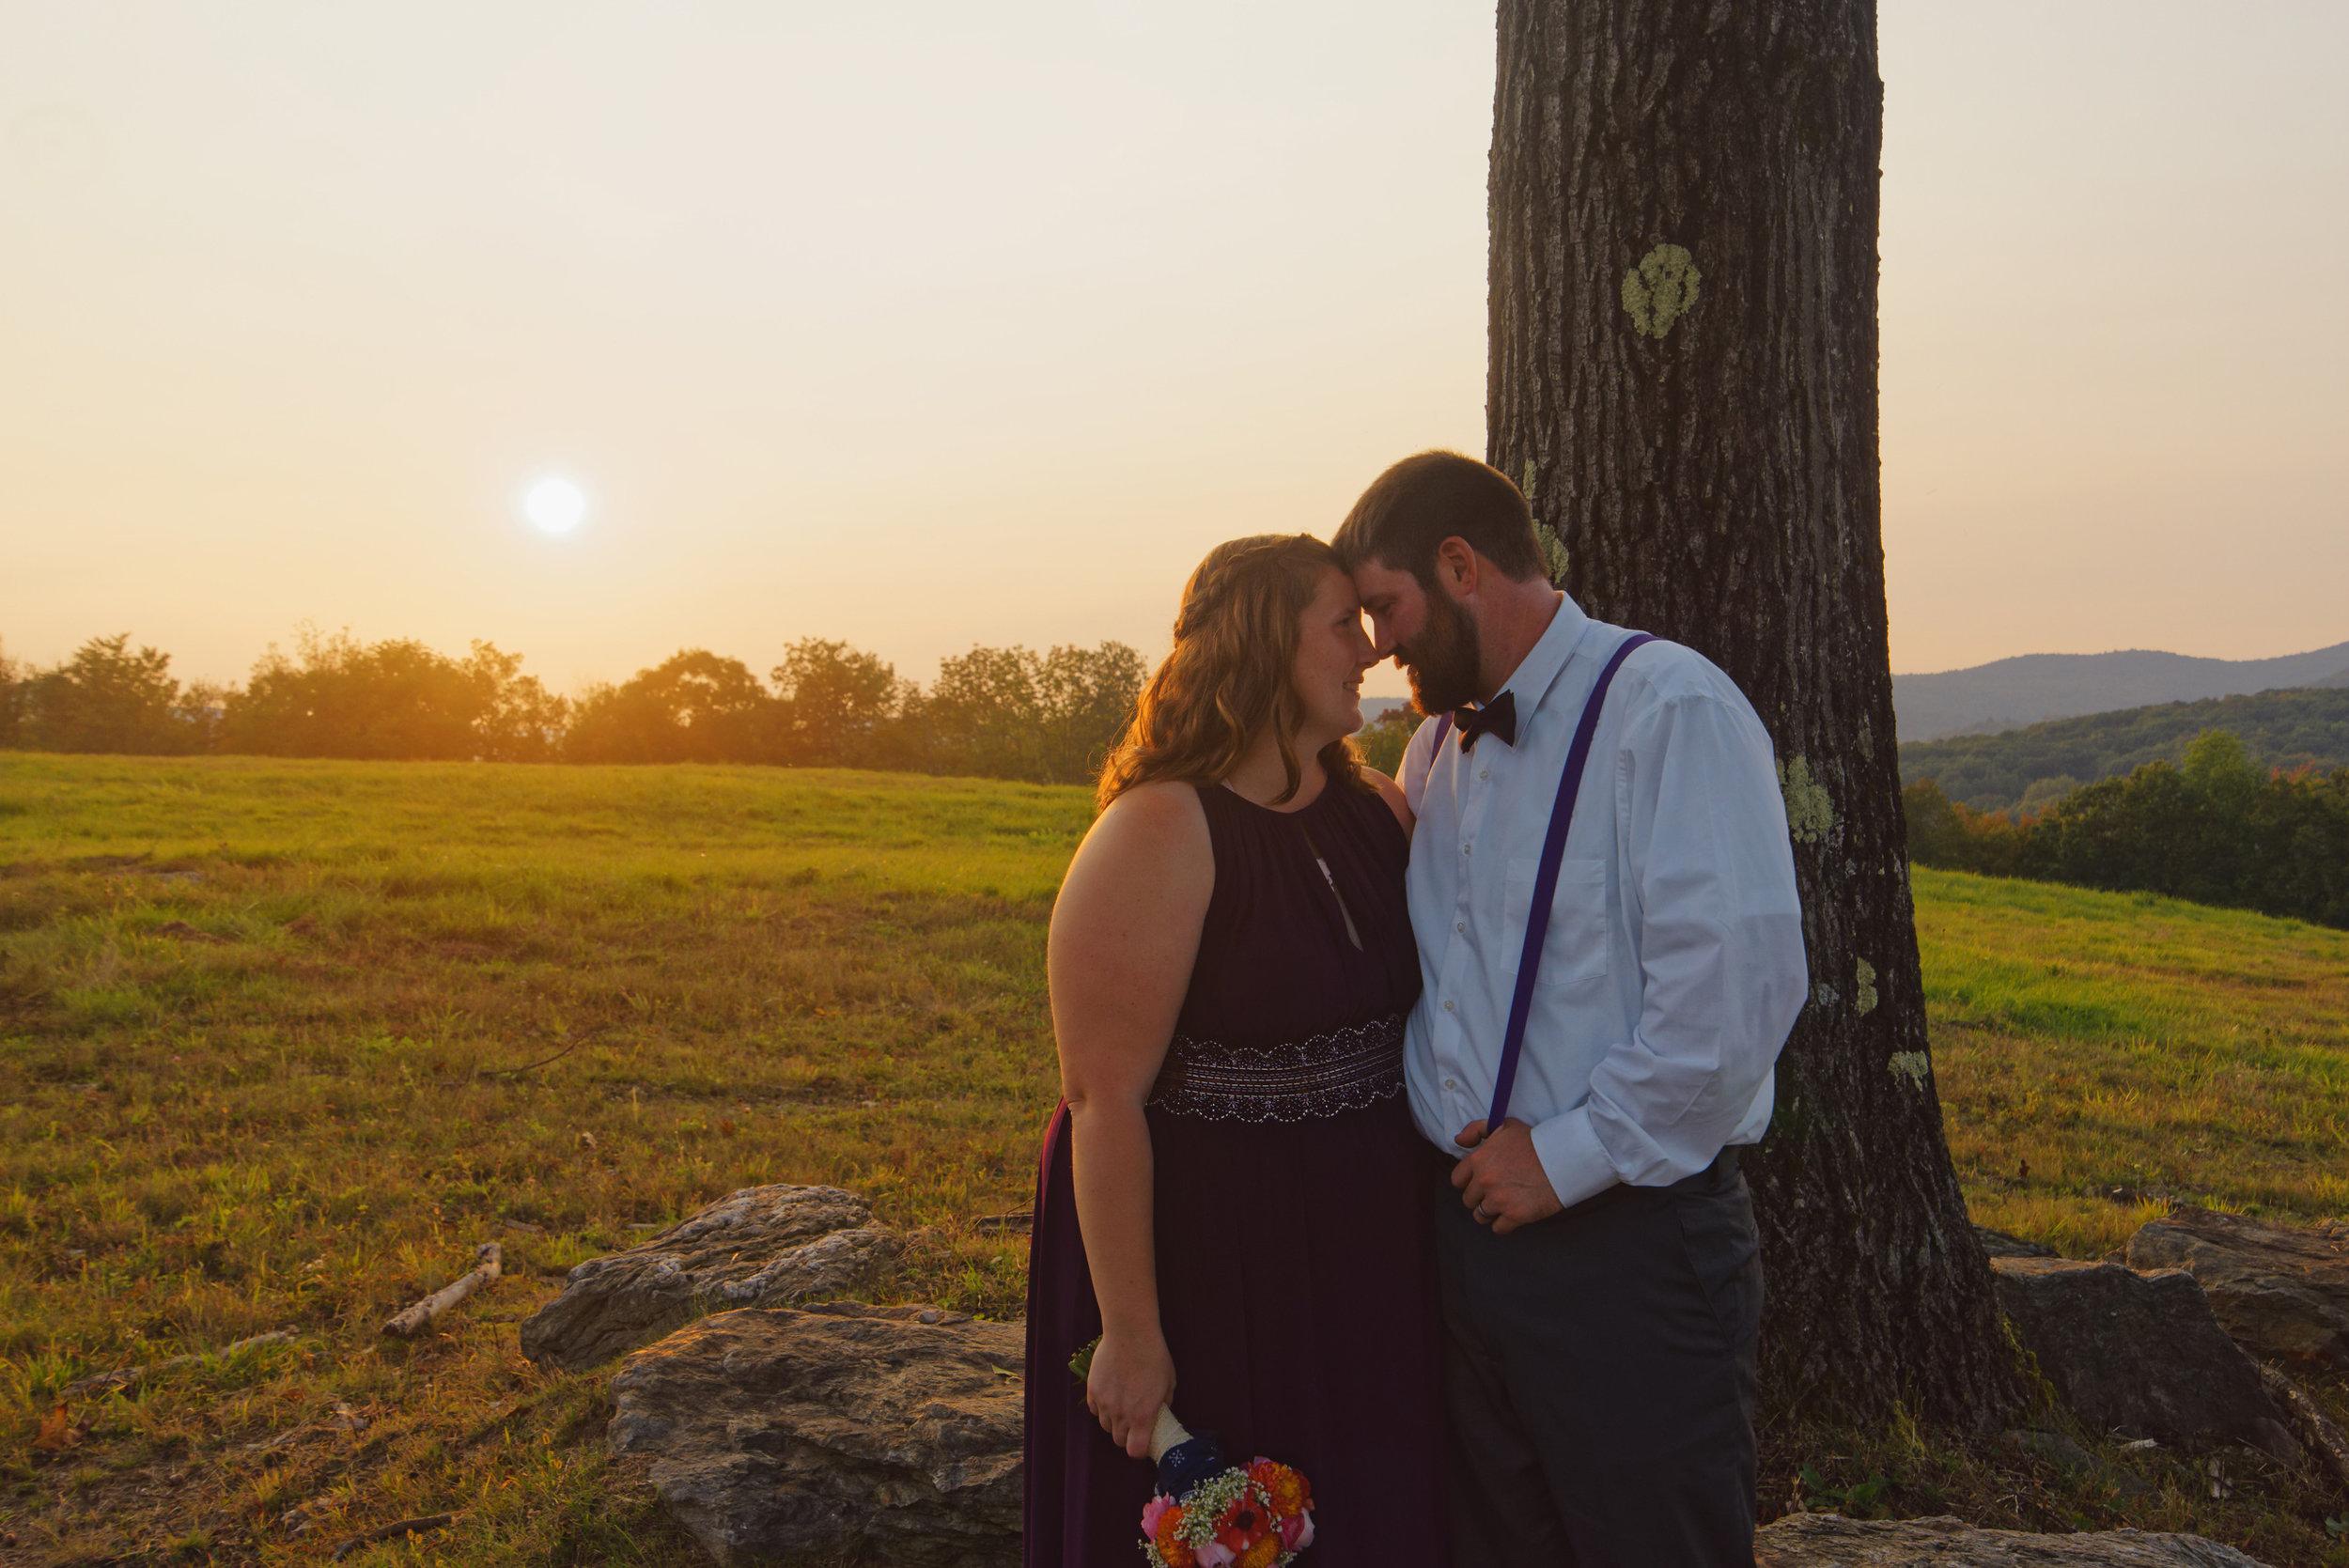 Jenn&Corby_Field_Sunset_Tree_CloseUp.jpg